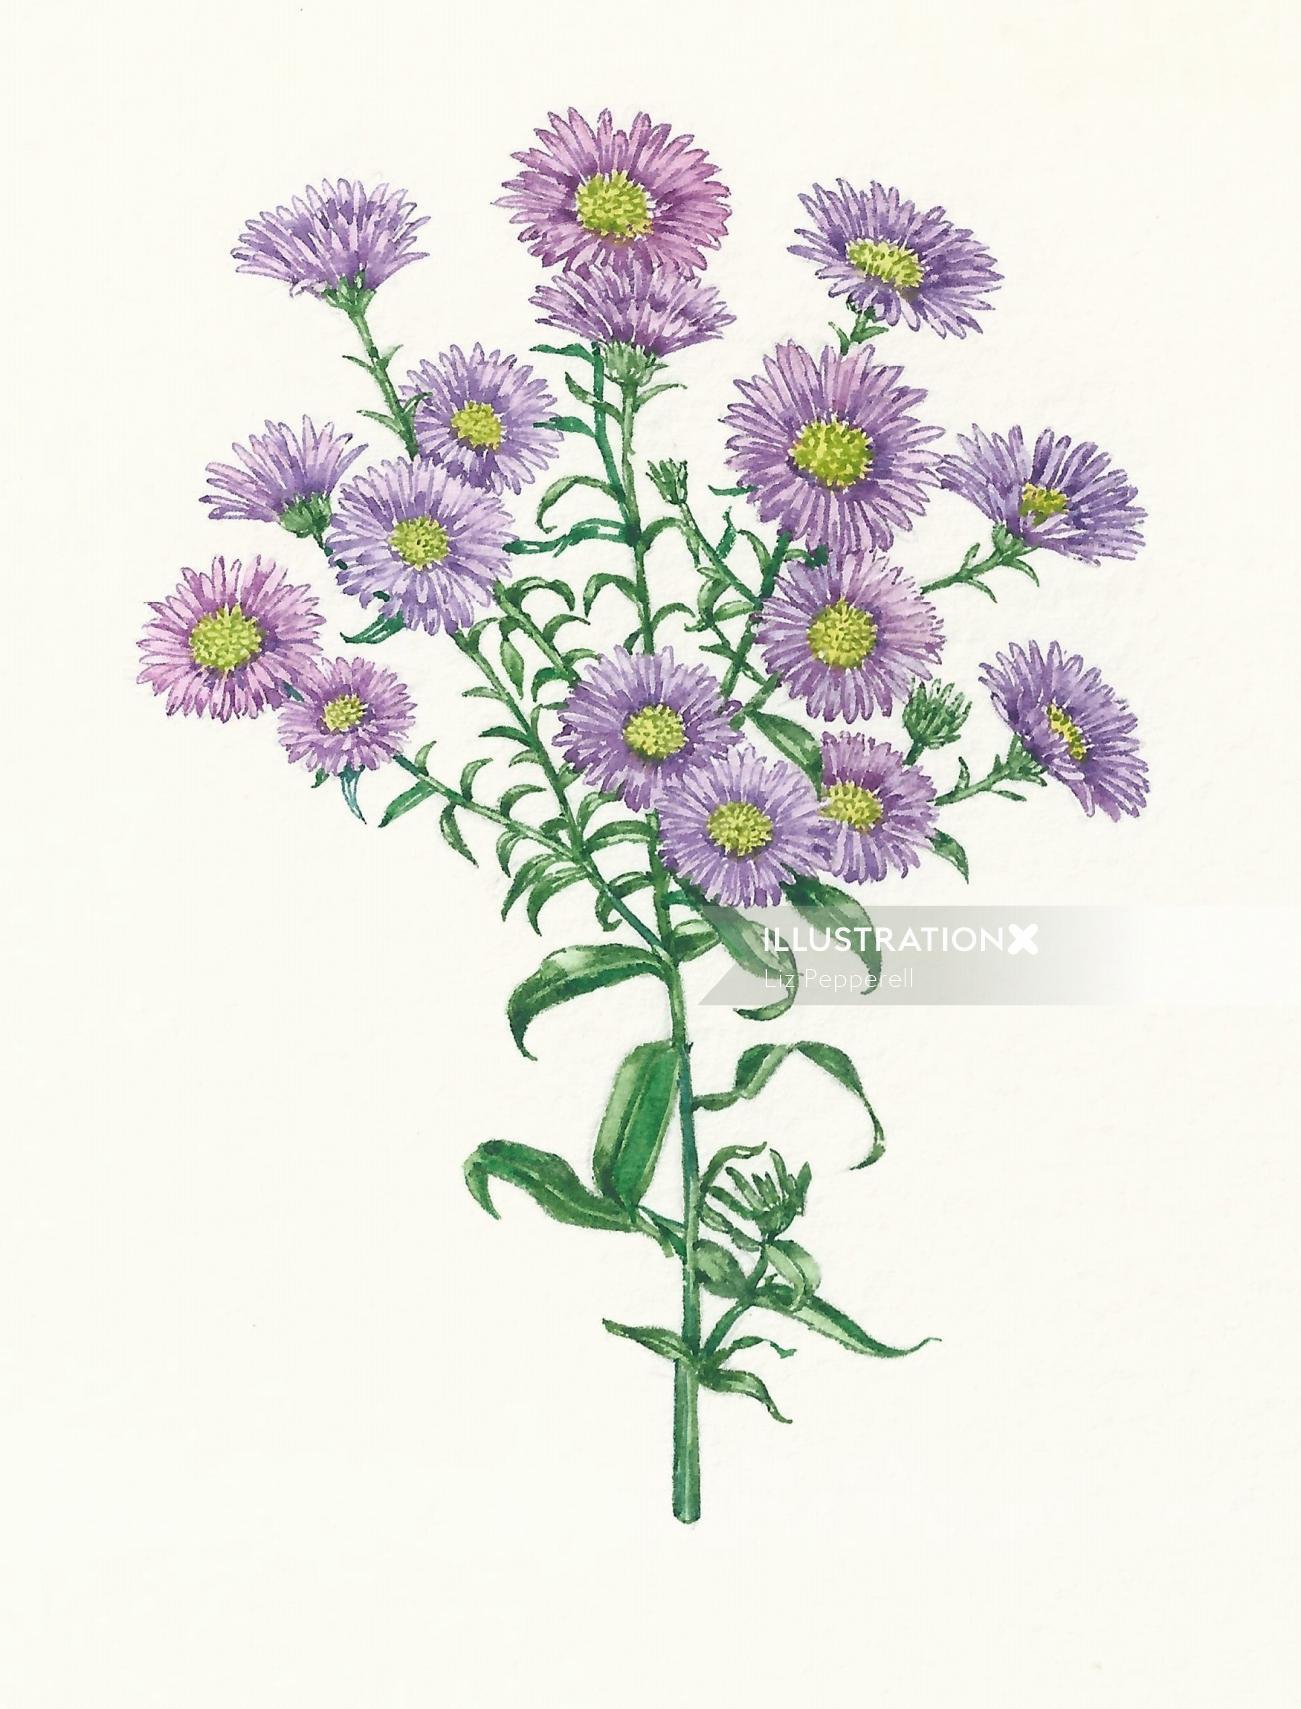 Watercolor art of Michaelmas Daisy